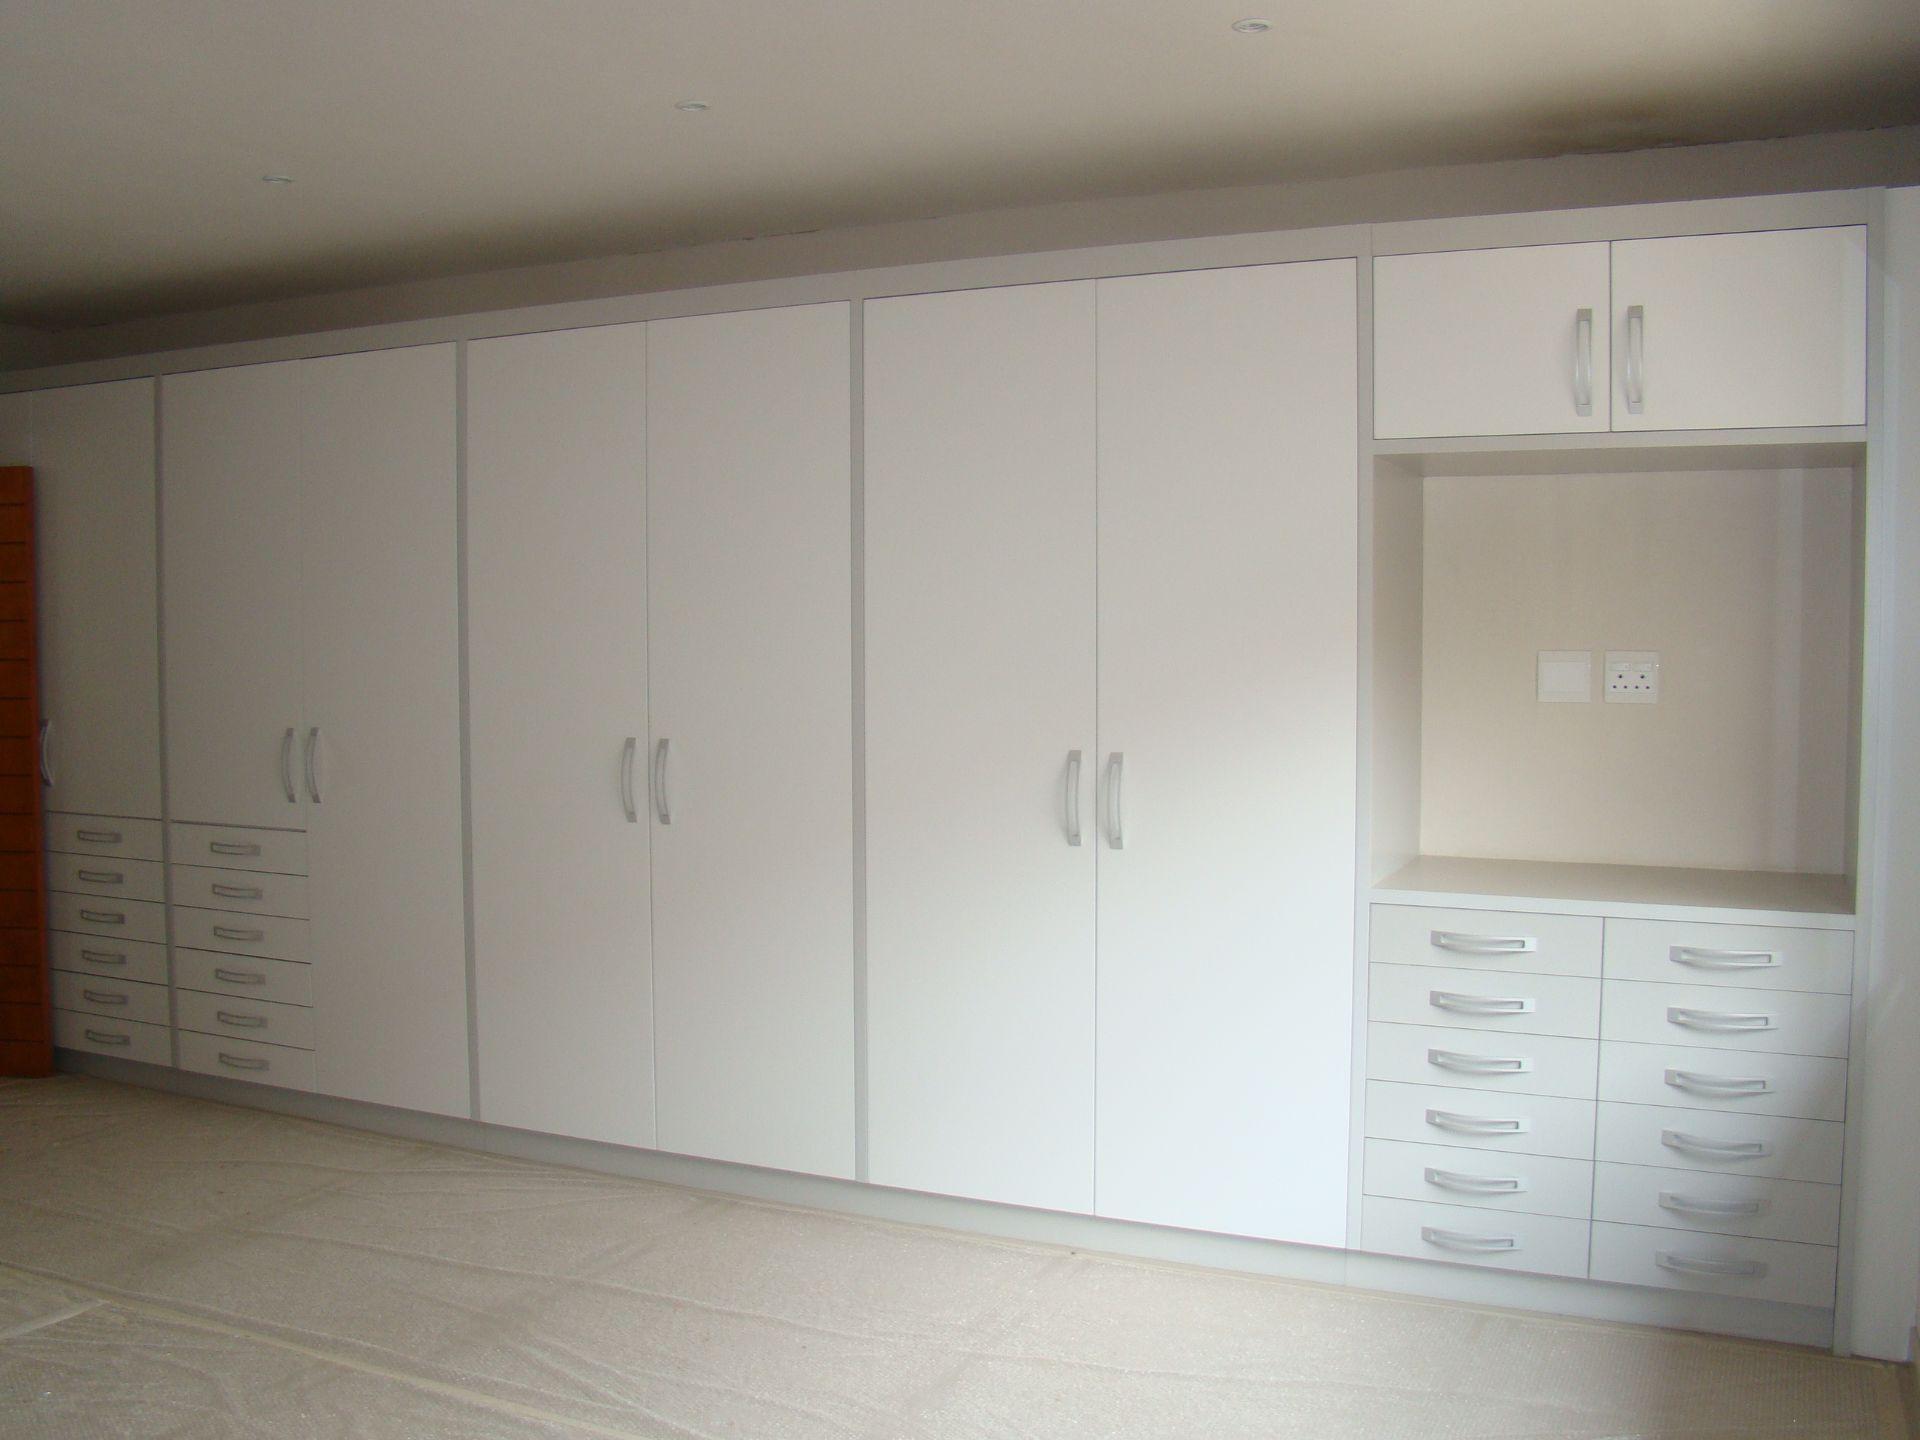 Craigavon mainbedroom cupboards.JPG